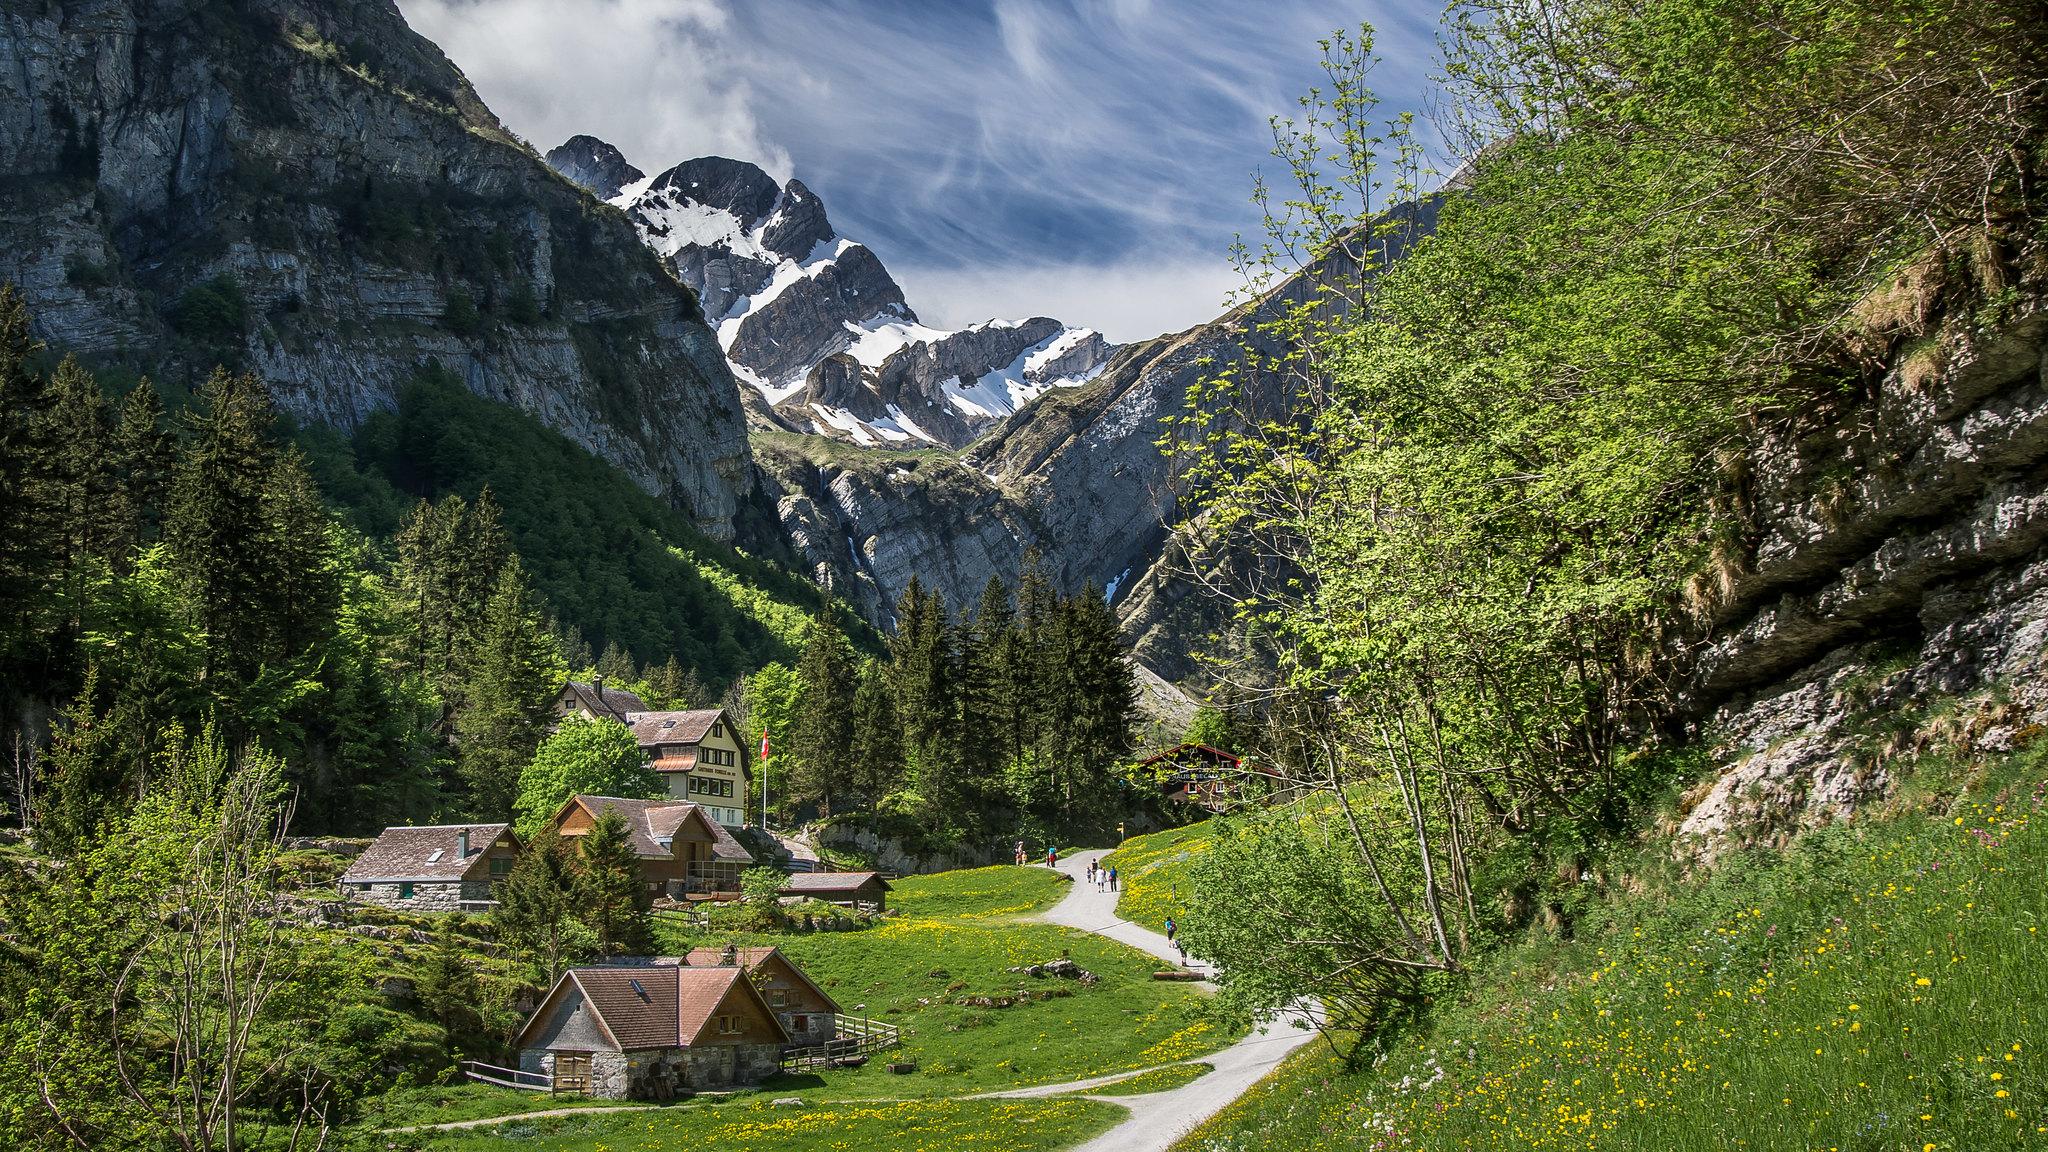 Appenzell, Switzerland. Photo credit: kuhnmi